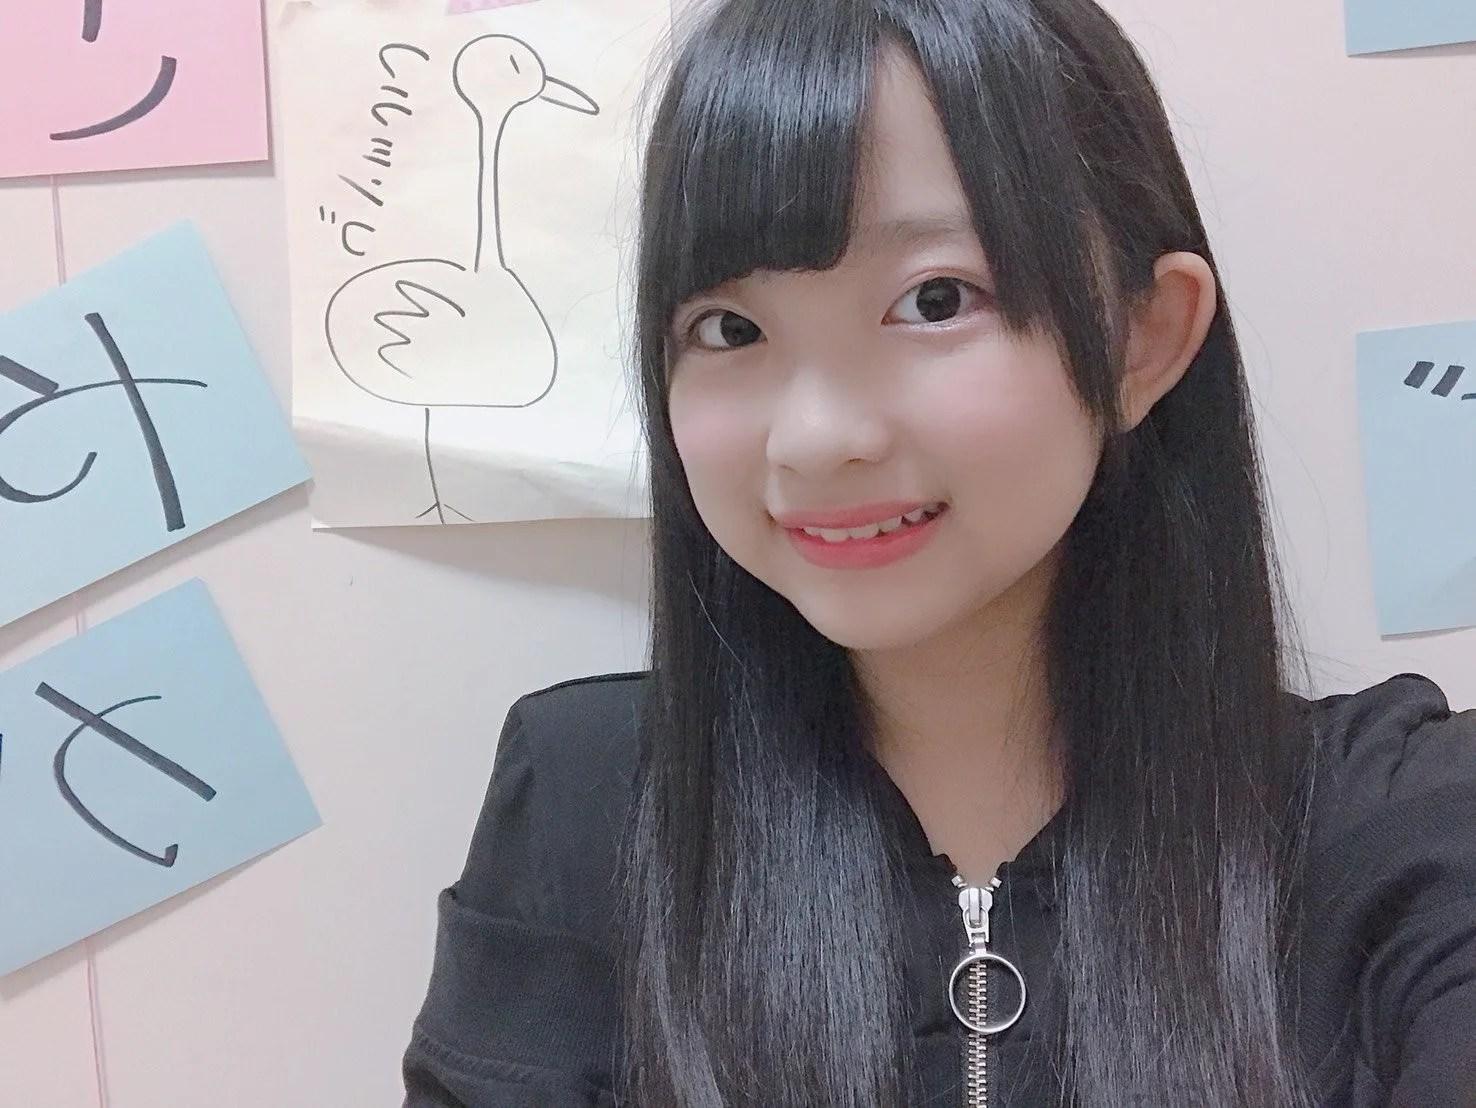 https://i1.wp.com/blogimg.goo.ne.jp/user_image/17/2e/d6caa0dcbdaffdaaaa3bbf7c515da504.jpg